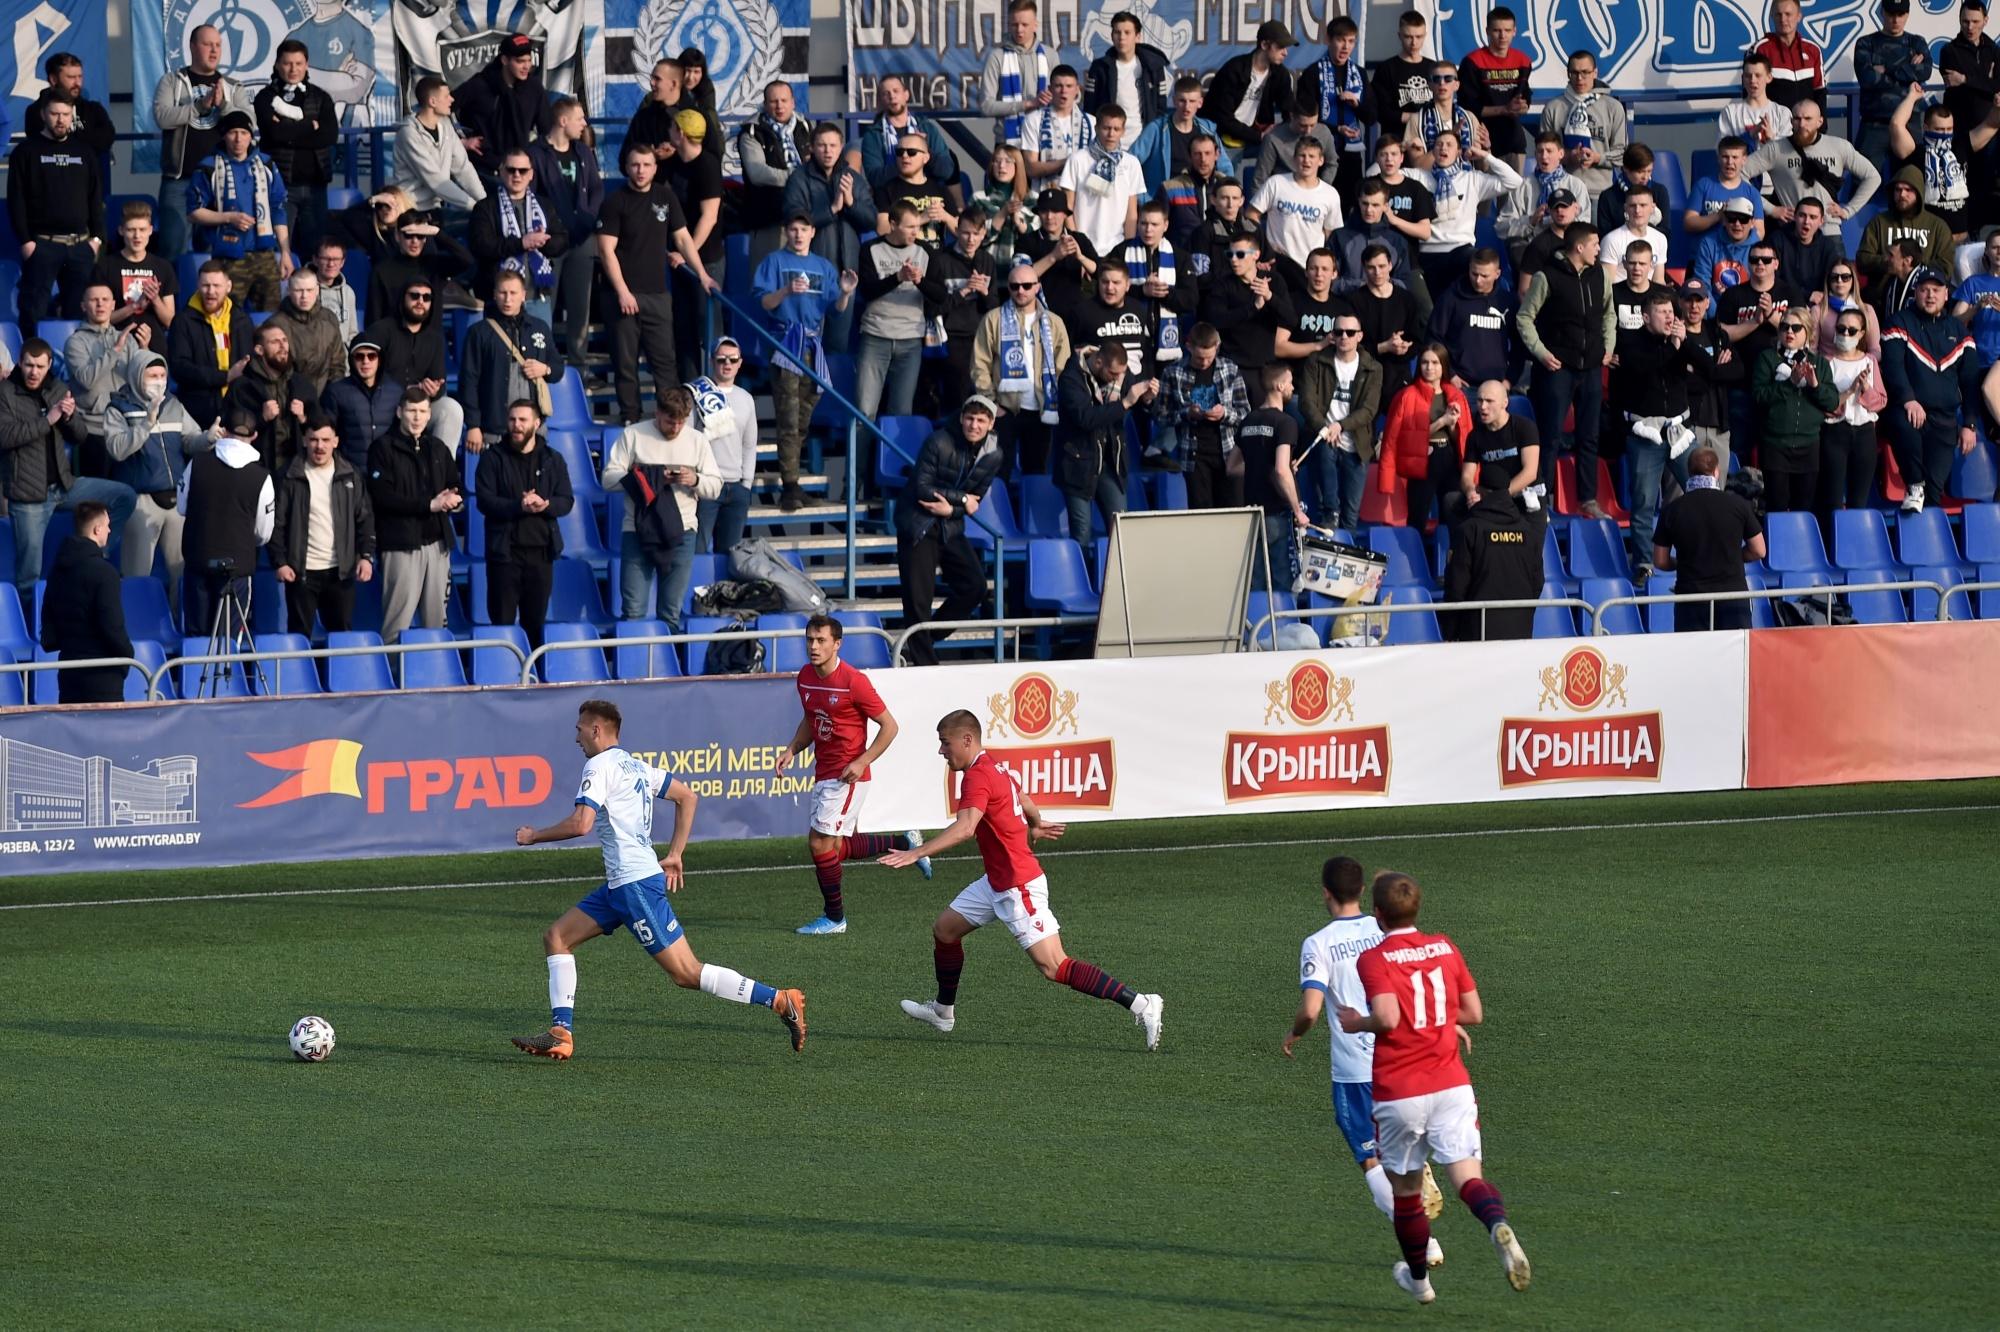 Pemain tim FC Minsk dan FC Dinamo-Minsk bersaing untuk mendapatkan bola selama pertandingan sepak bola Belarus Championship di Minsk pada 28 Maret.